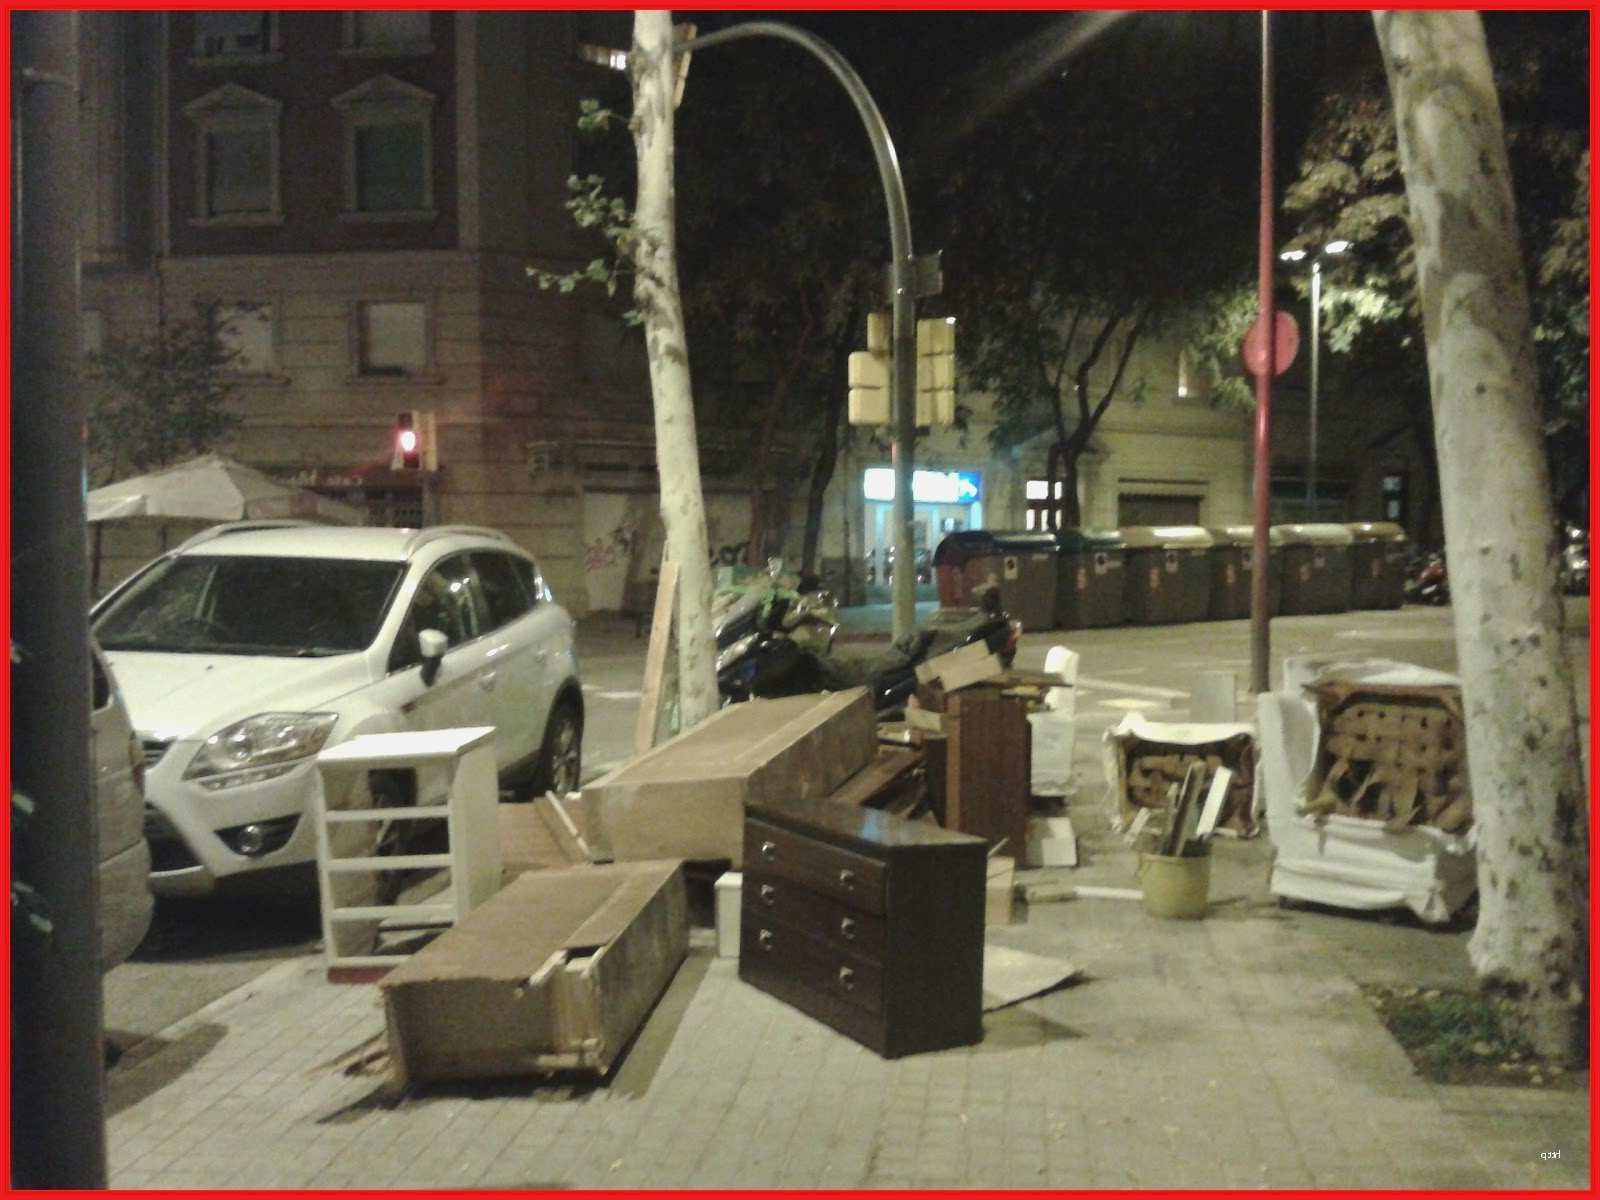 Recogida De Muebles En Barcelona Bqdd Recogida De Muebles En Barcelona Fresh Inspirador Recogida De